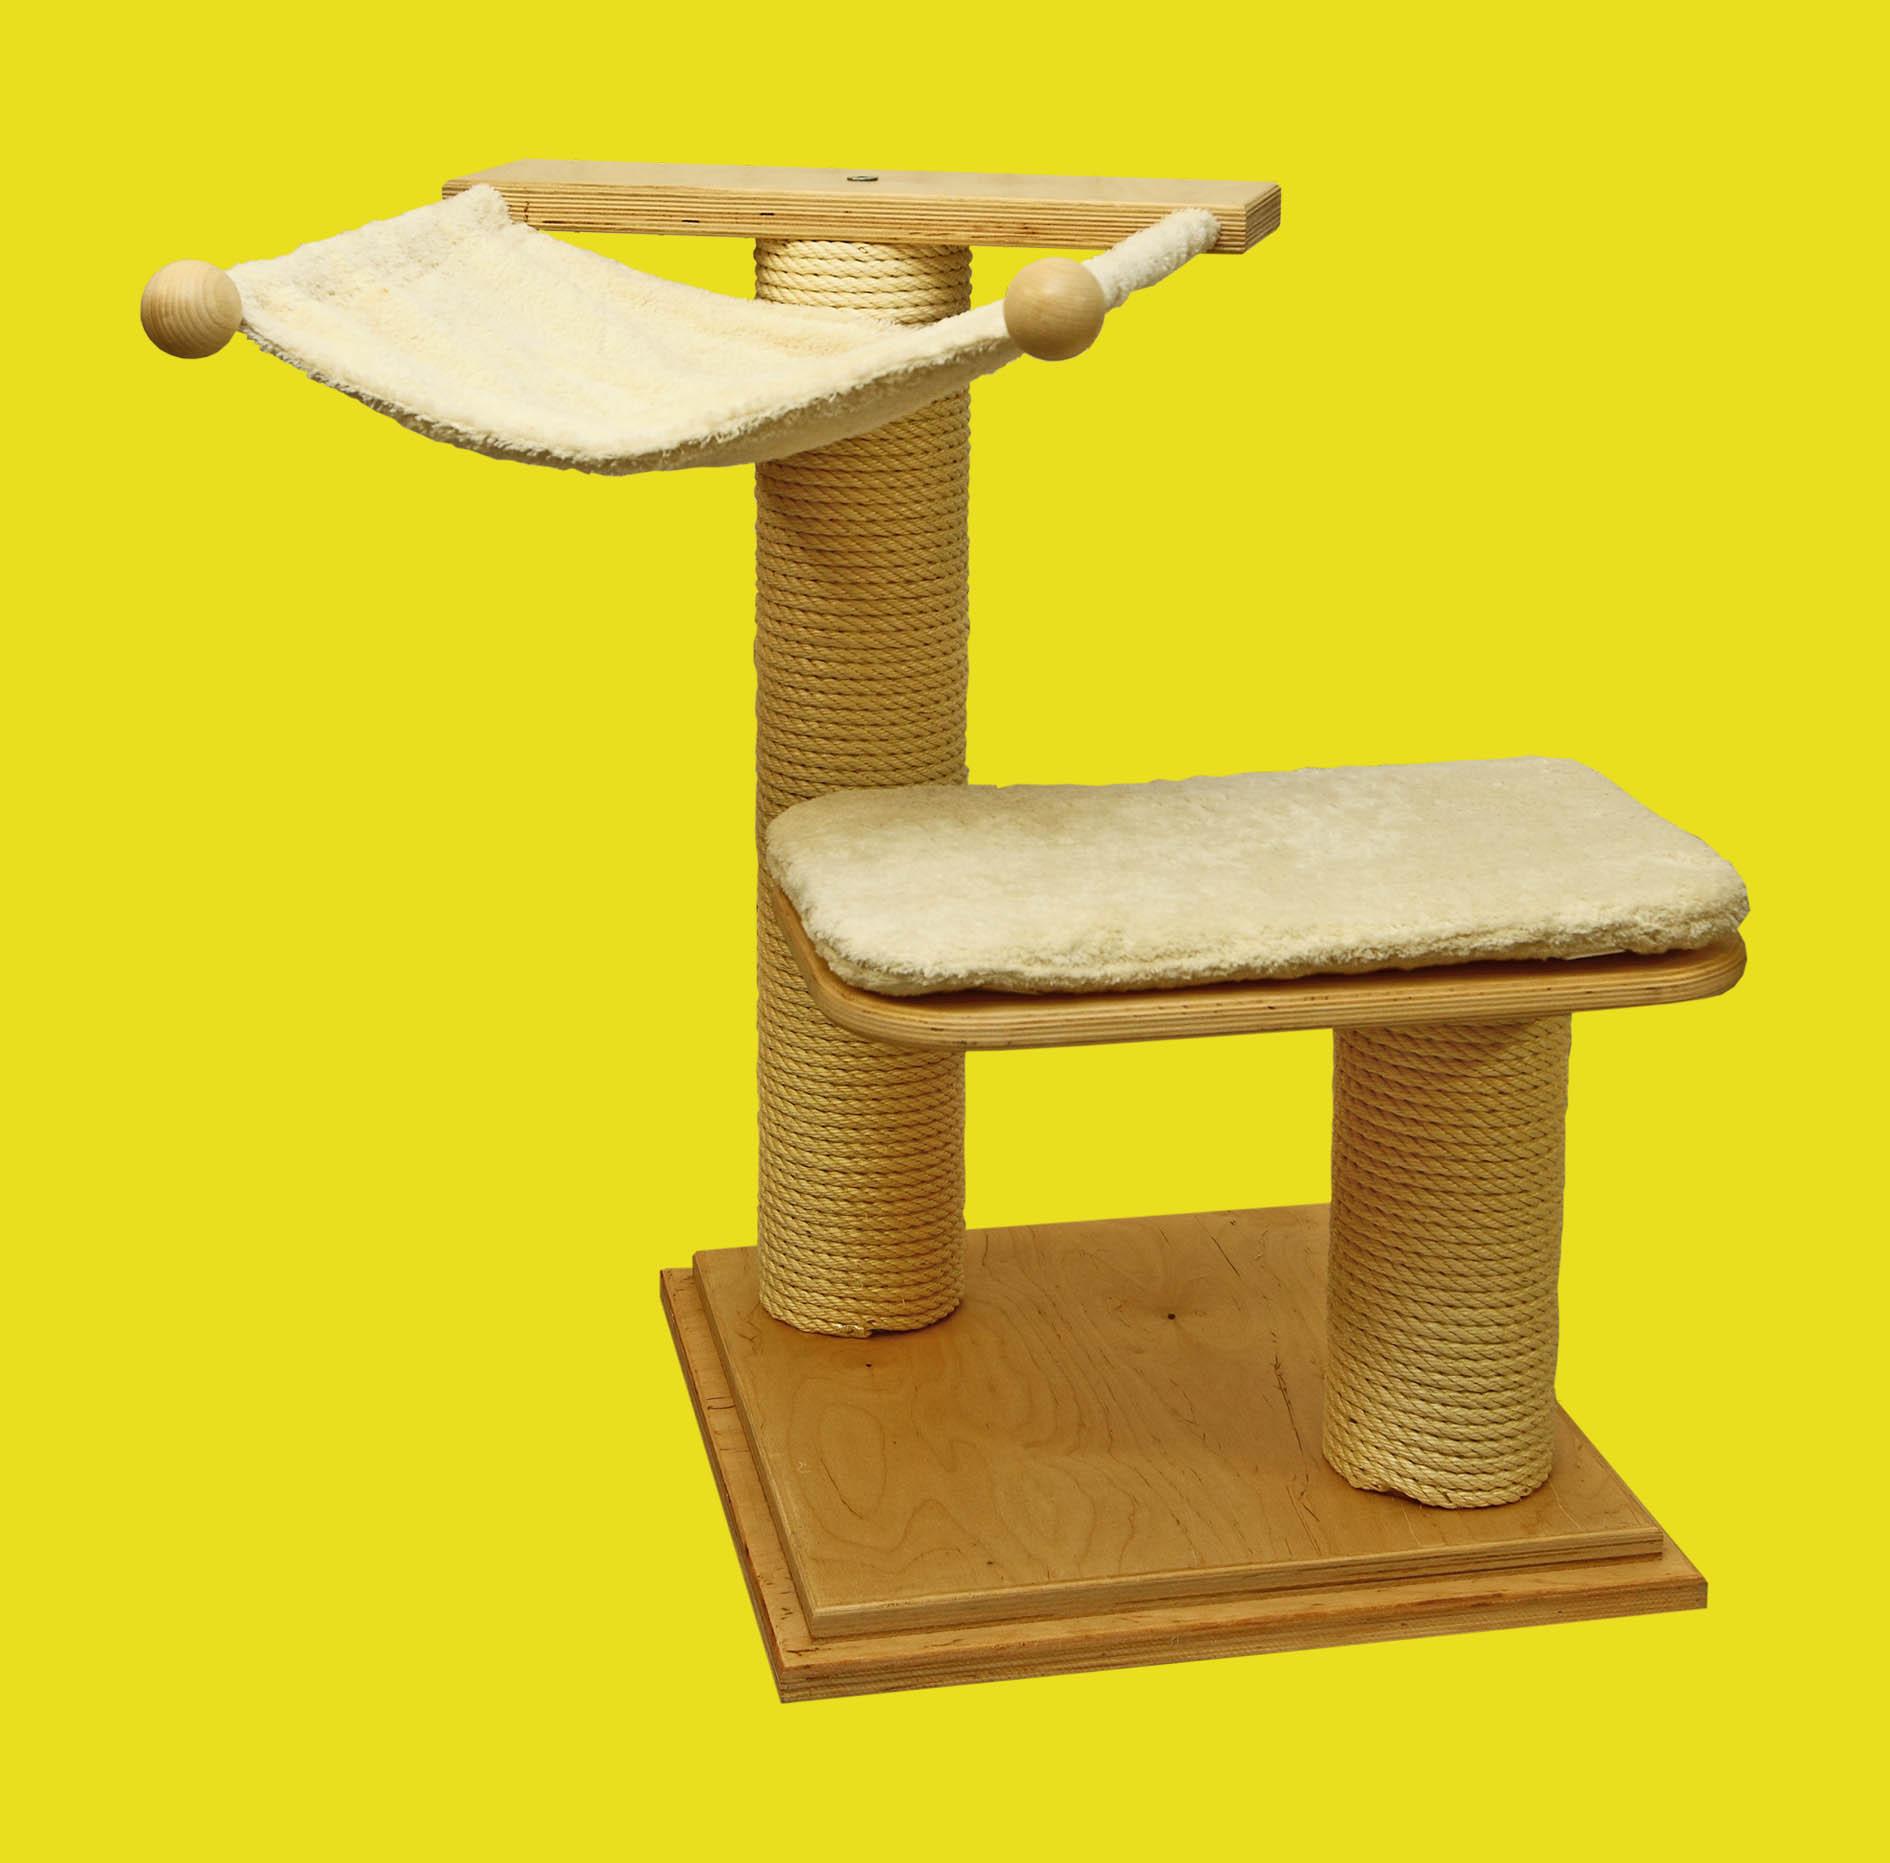 katzenb ume klein katzen trudys fuettertaesche. Black Bedroom Furniture Sets. Home Design Ideas